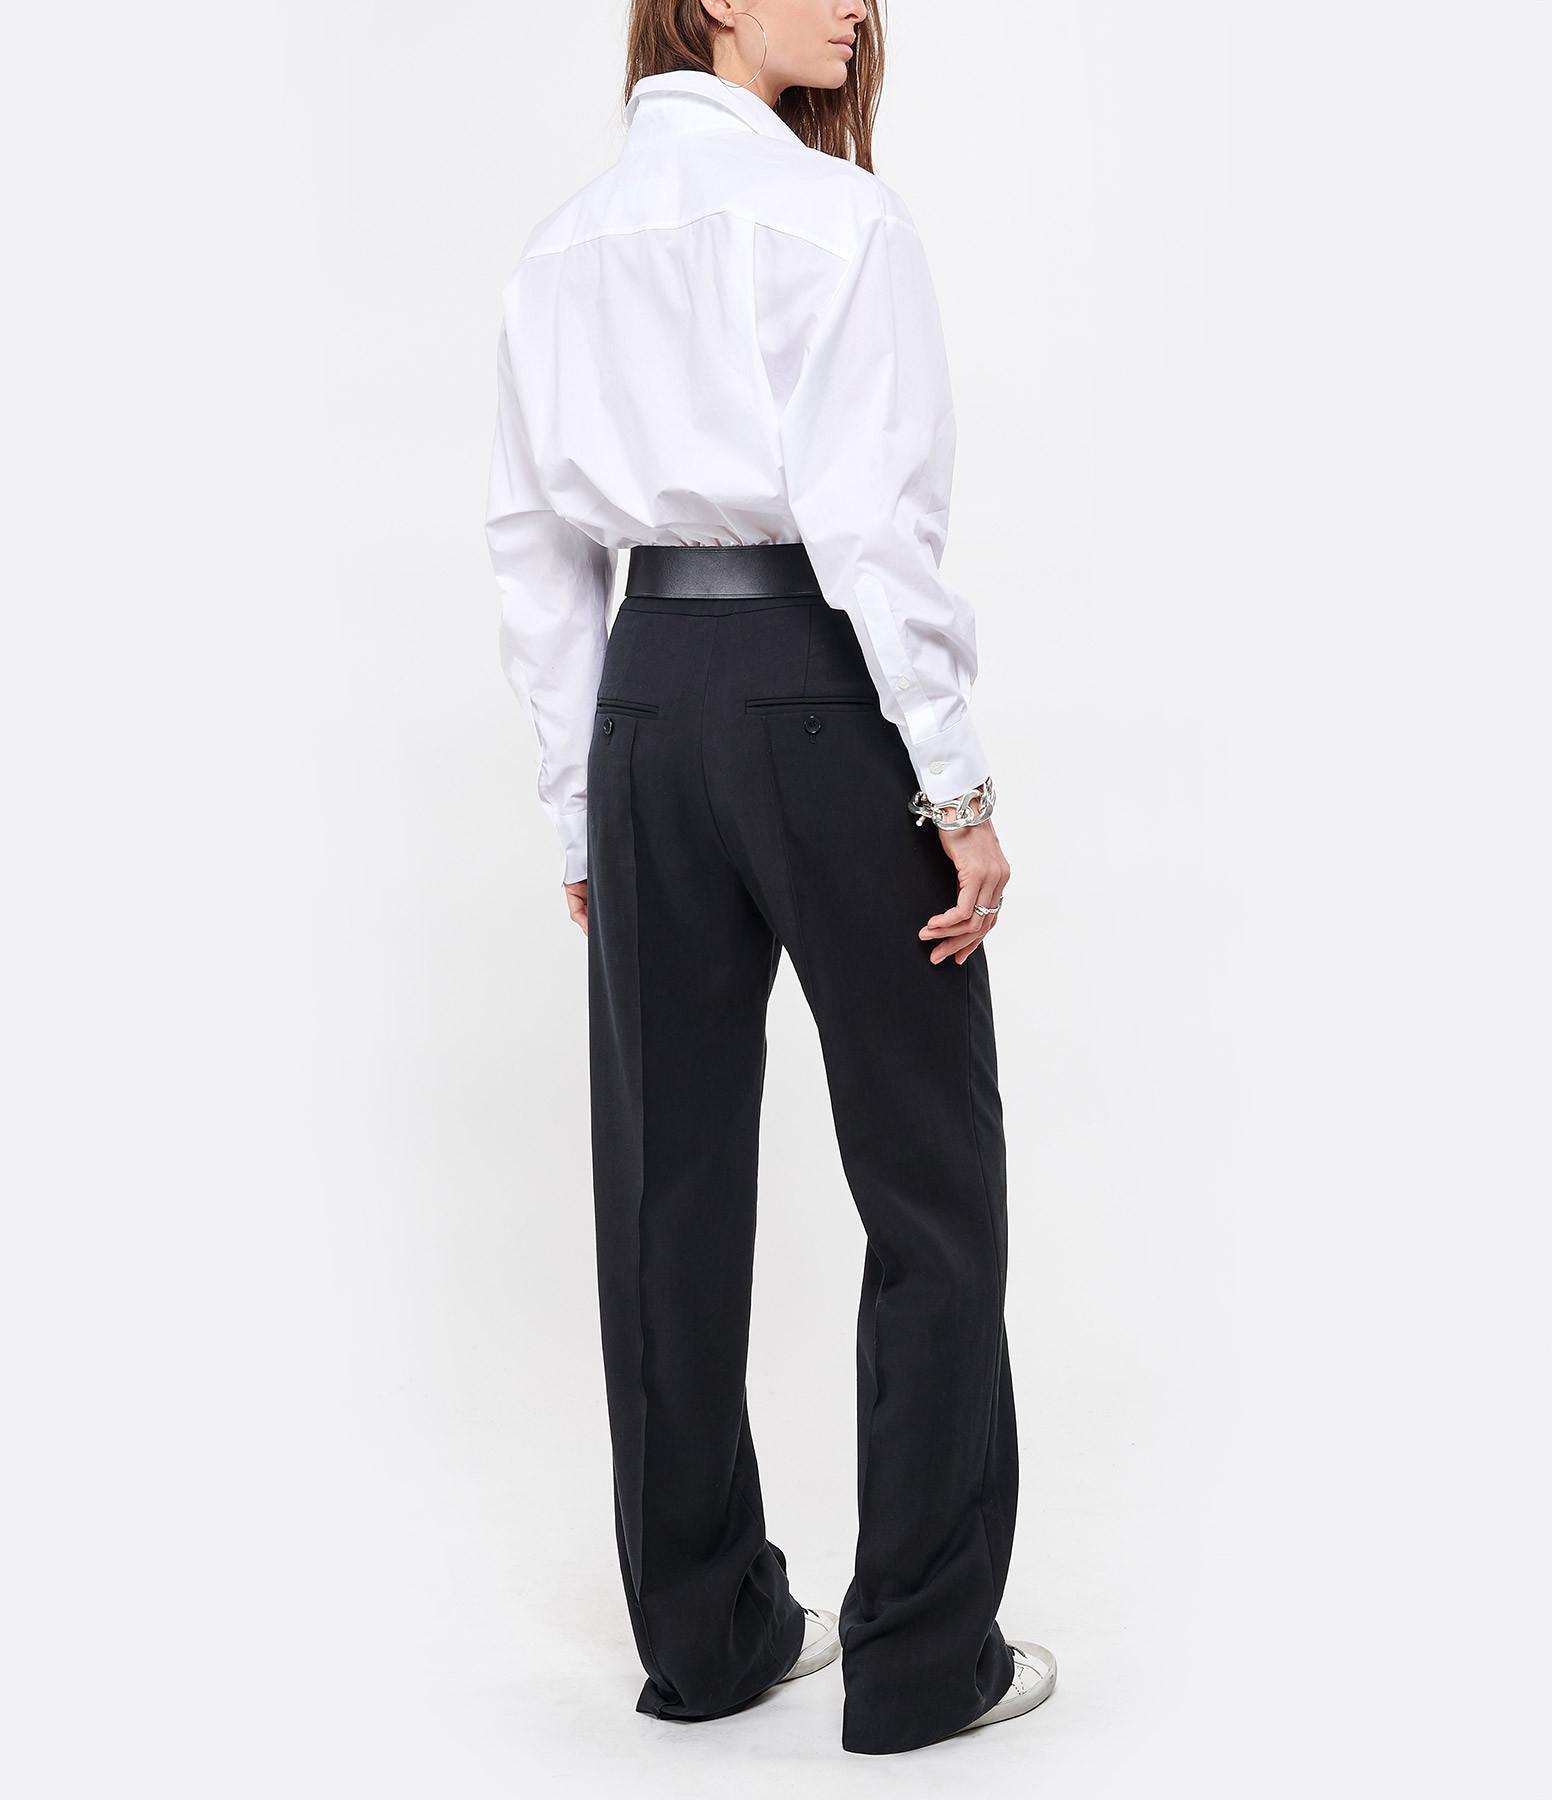 MM6 MAISON MARGIELA - Body Coton Blanc, Collection Studio